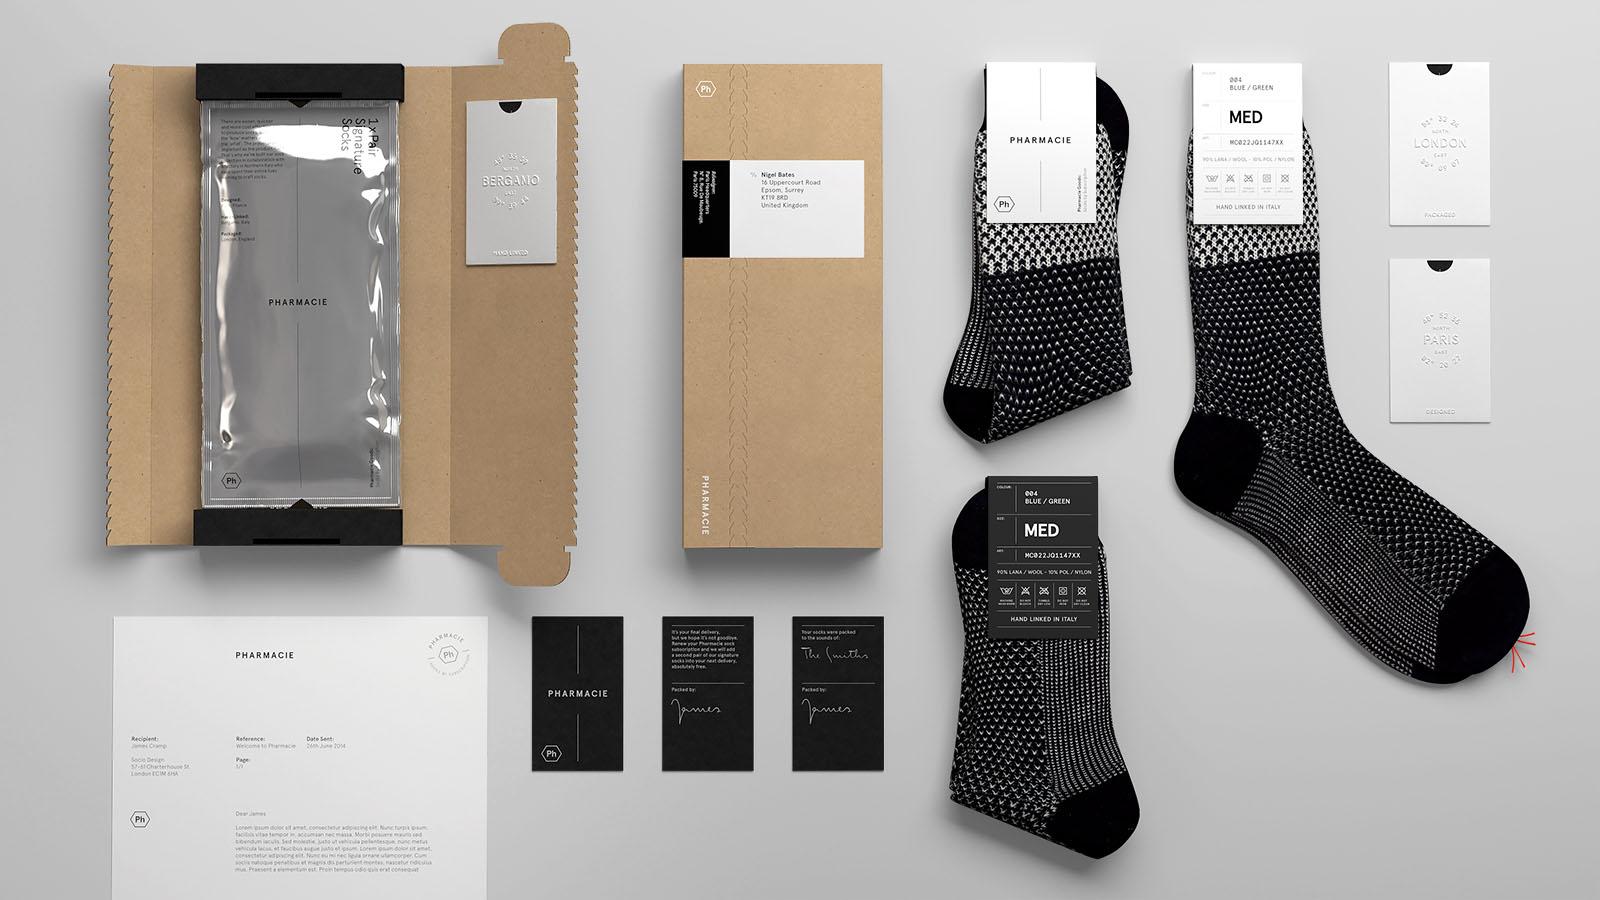 Pharmacie Goods The Sock Subscription Service On